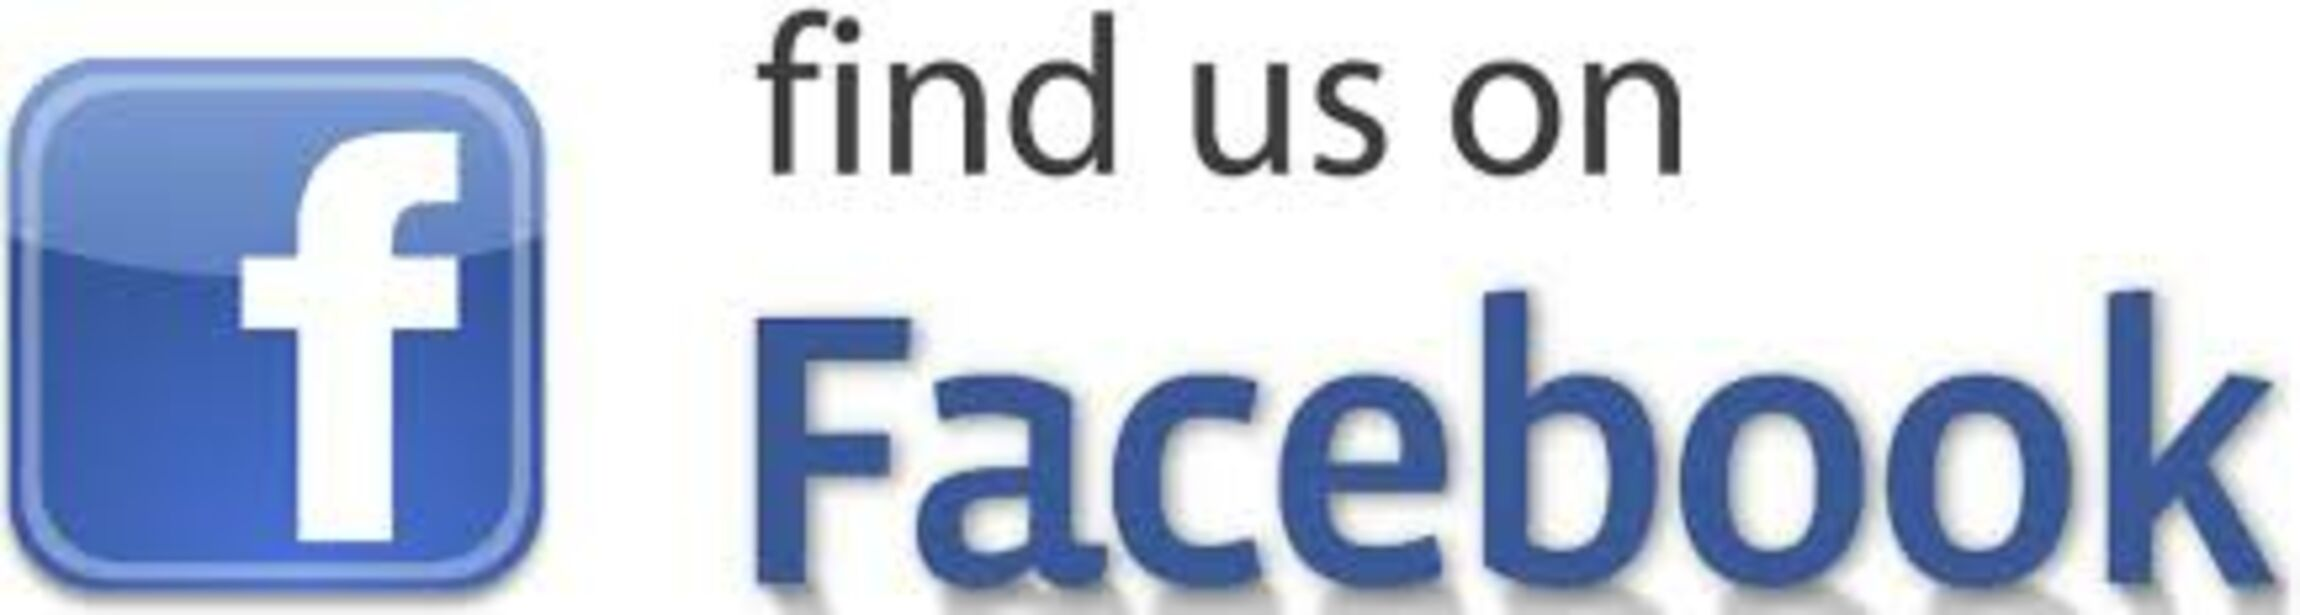 fb_logo2